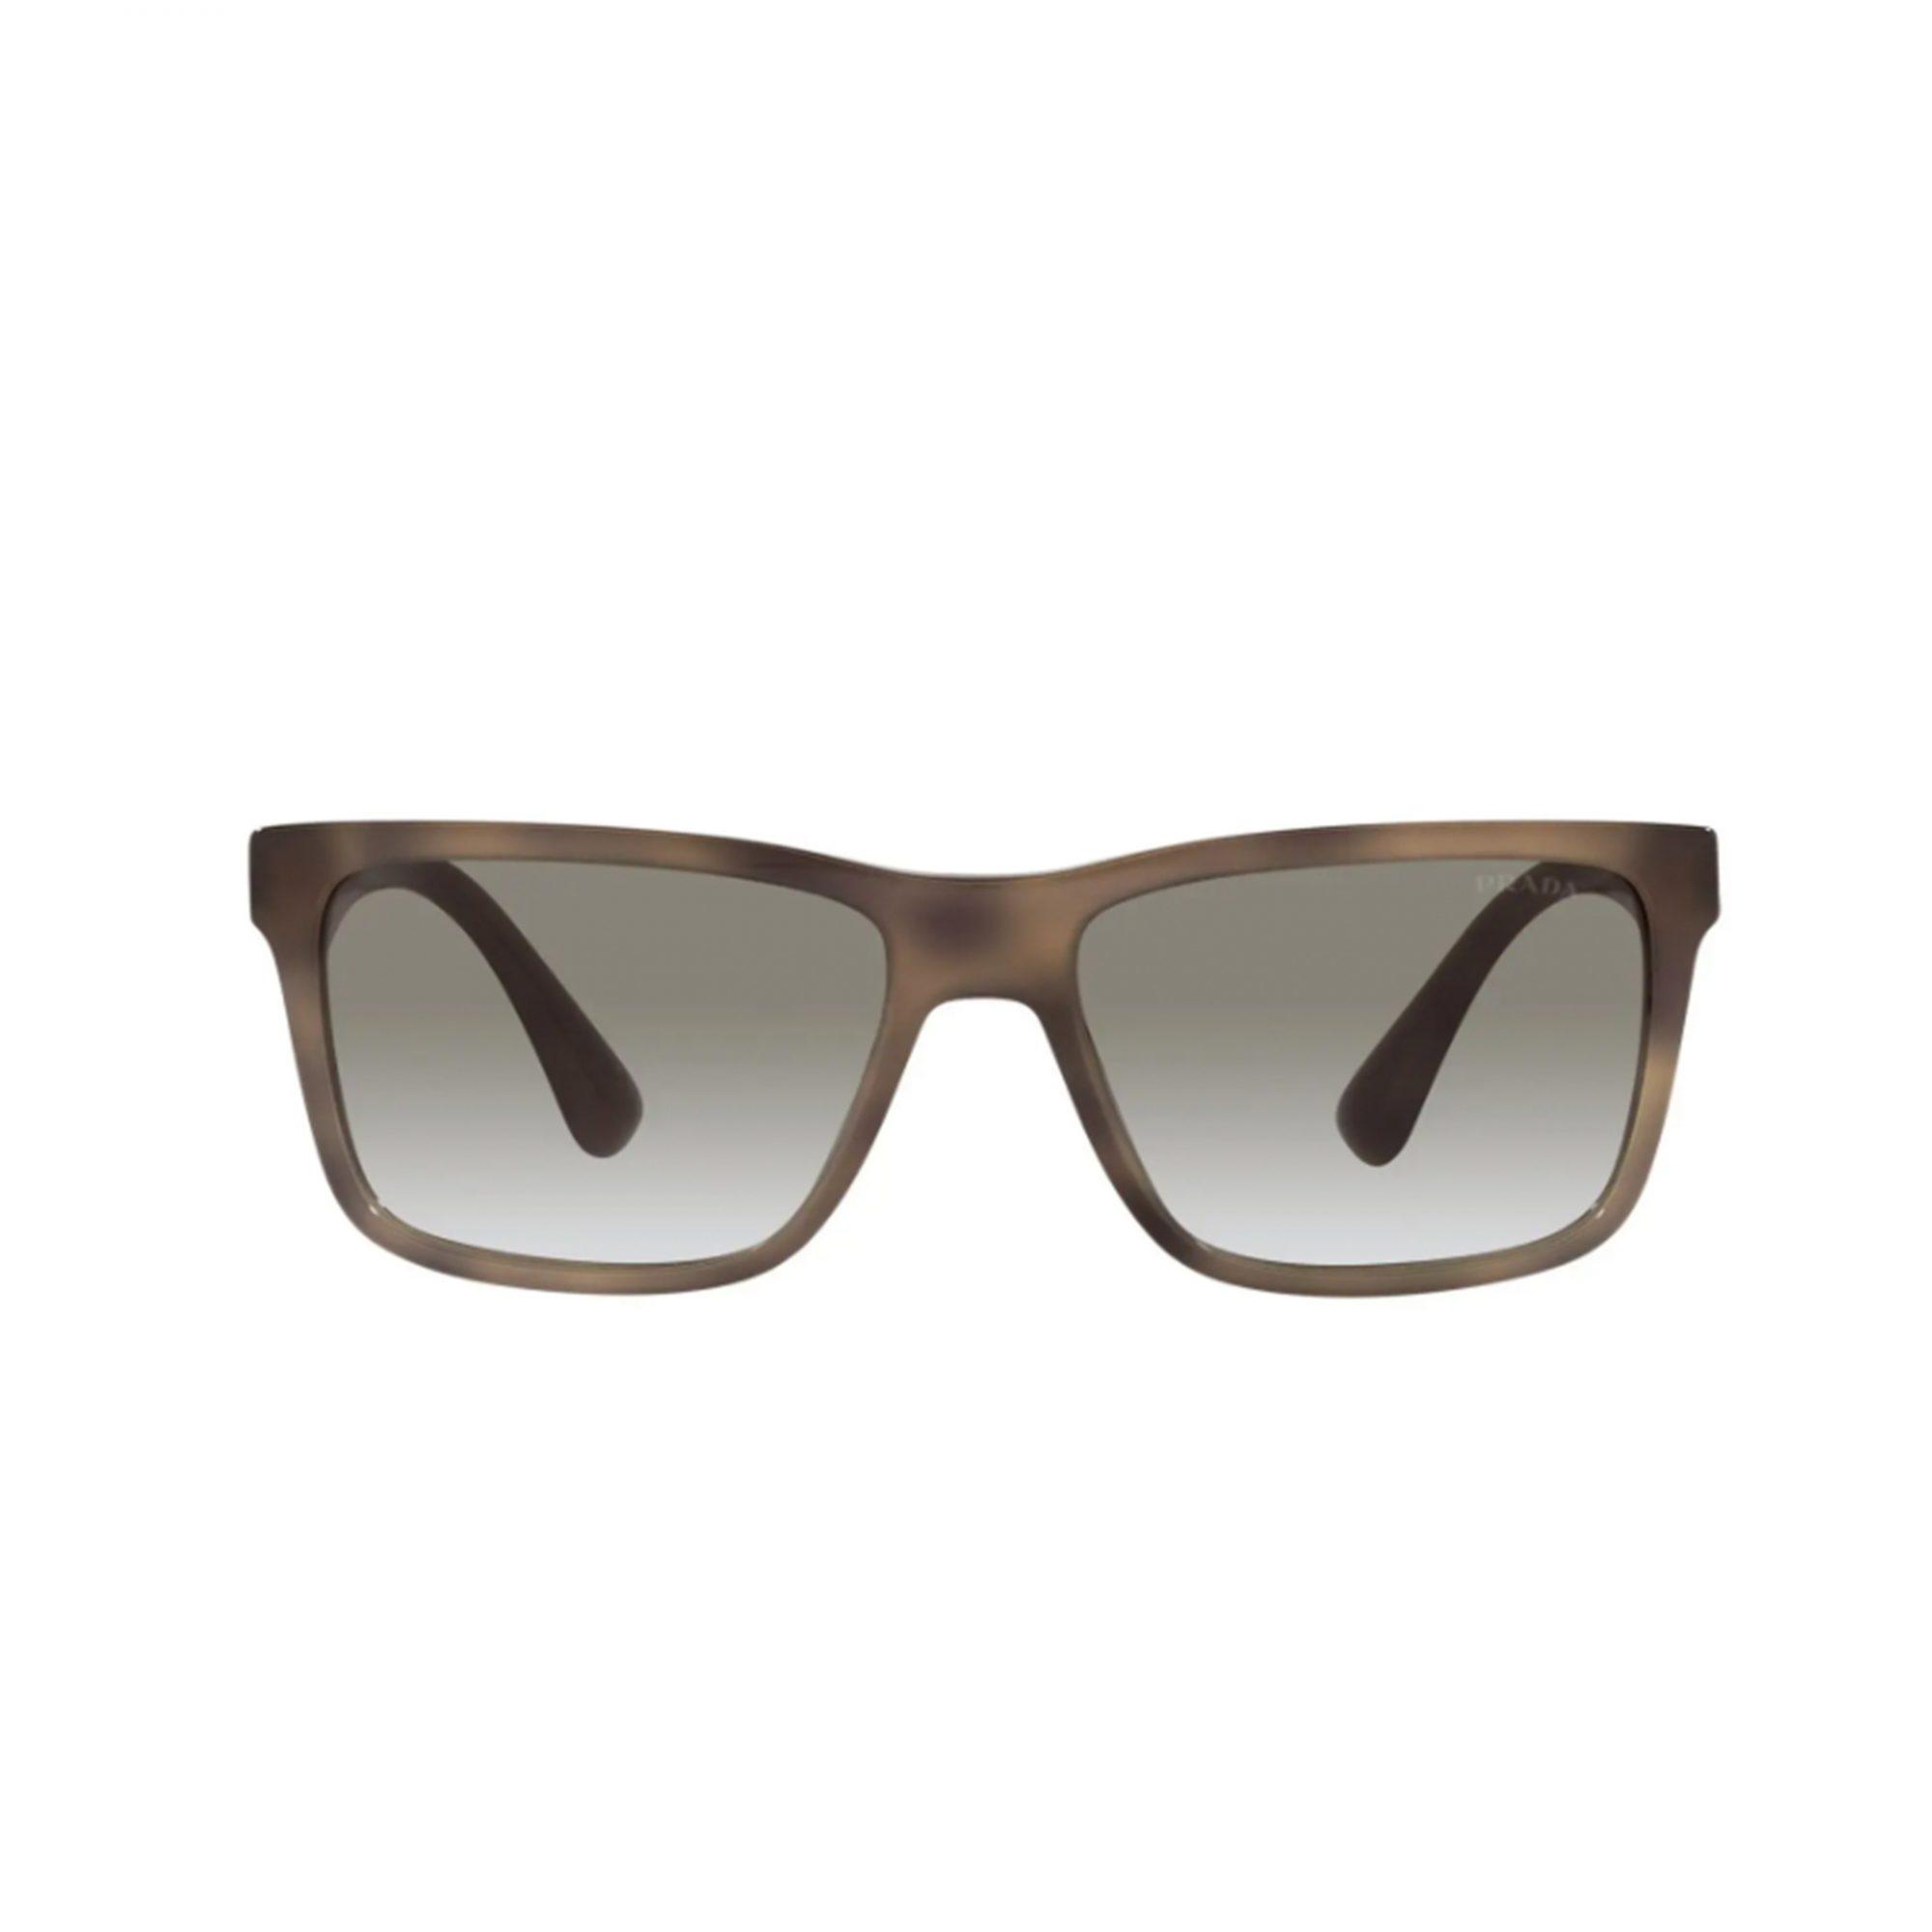 prada-squared-mirrored-sunglasses